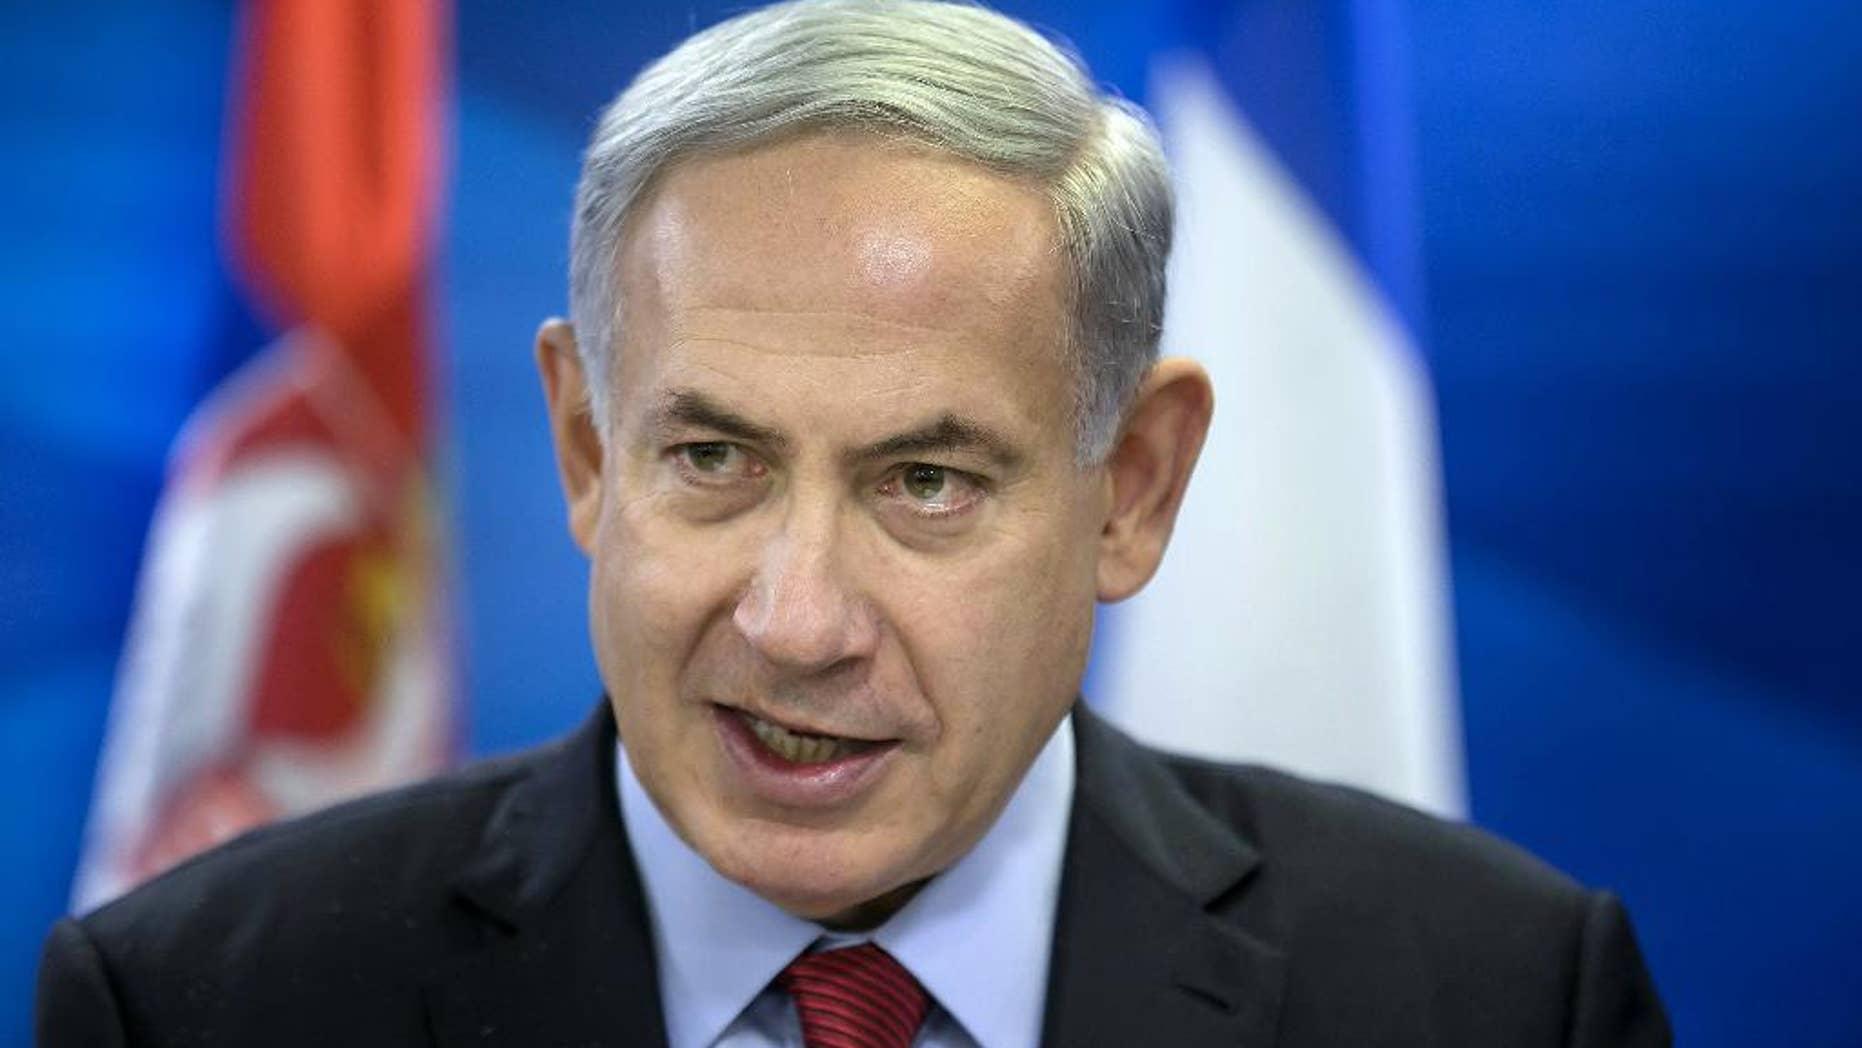 Israel's Prime Minister Benjamin Netanyahu speaks during a meeting with his Serbian counterpart Aleksandar Vucic in Jerusalem, Monday, Dec. 1, 2014. (AP Photo/Baz Ratner, Pool)